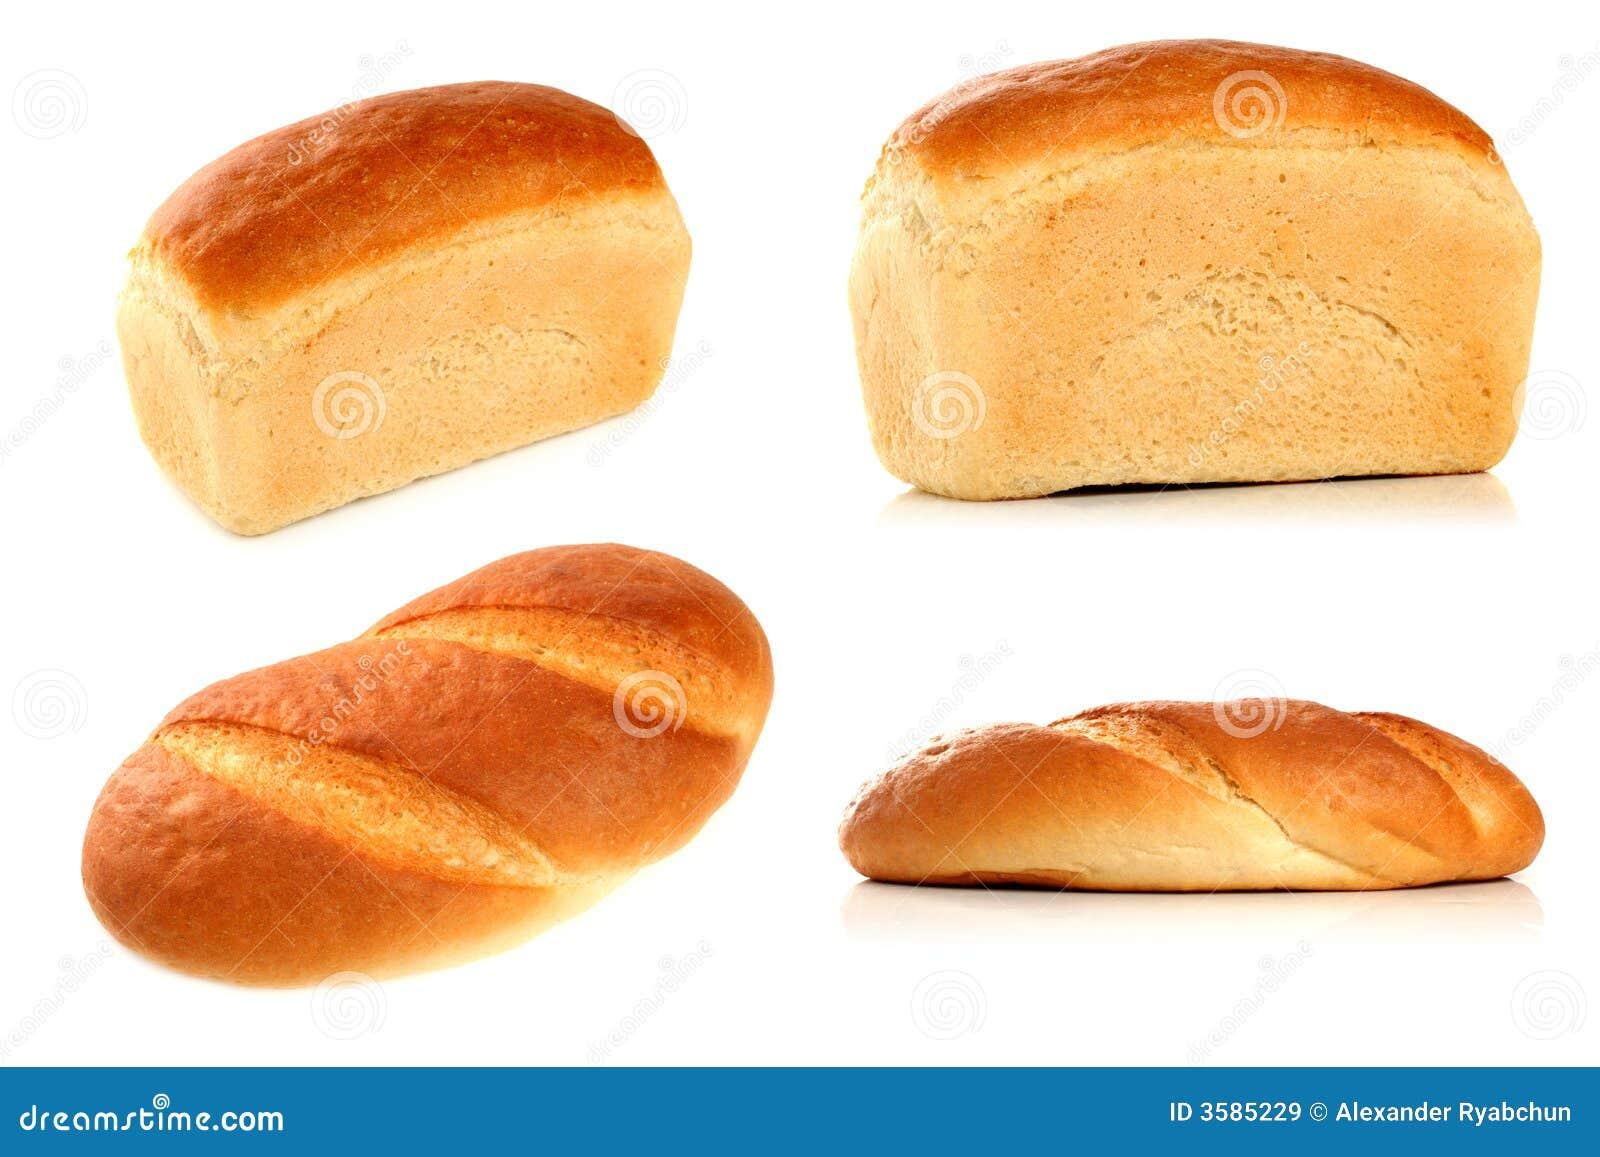 Rodzaj różnych chleba